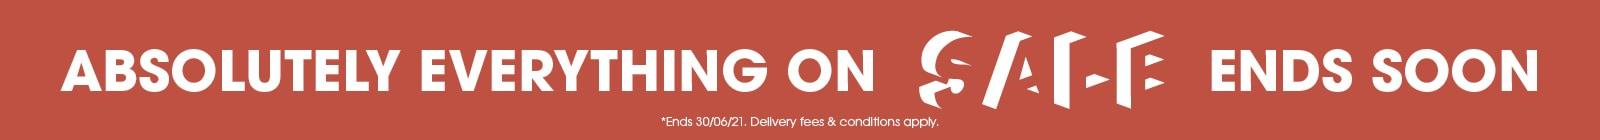 WDTNZ_105913 NZ AEOS Wk39 Homepage-Web Assets_v2_1.jpg